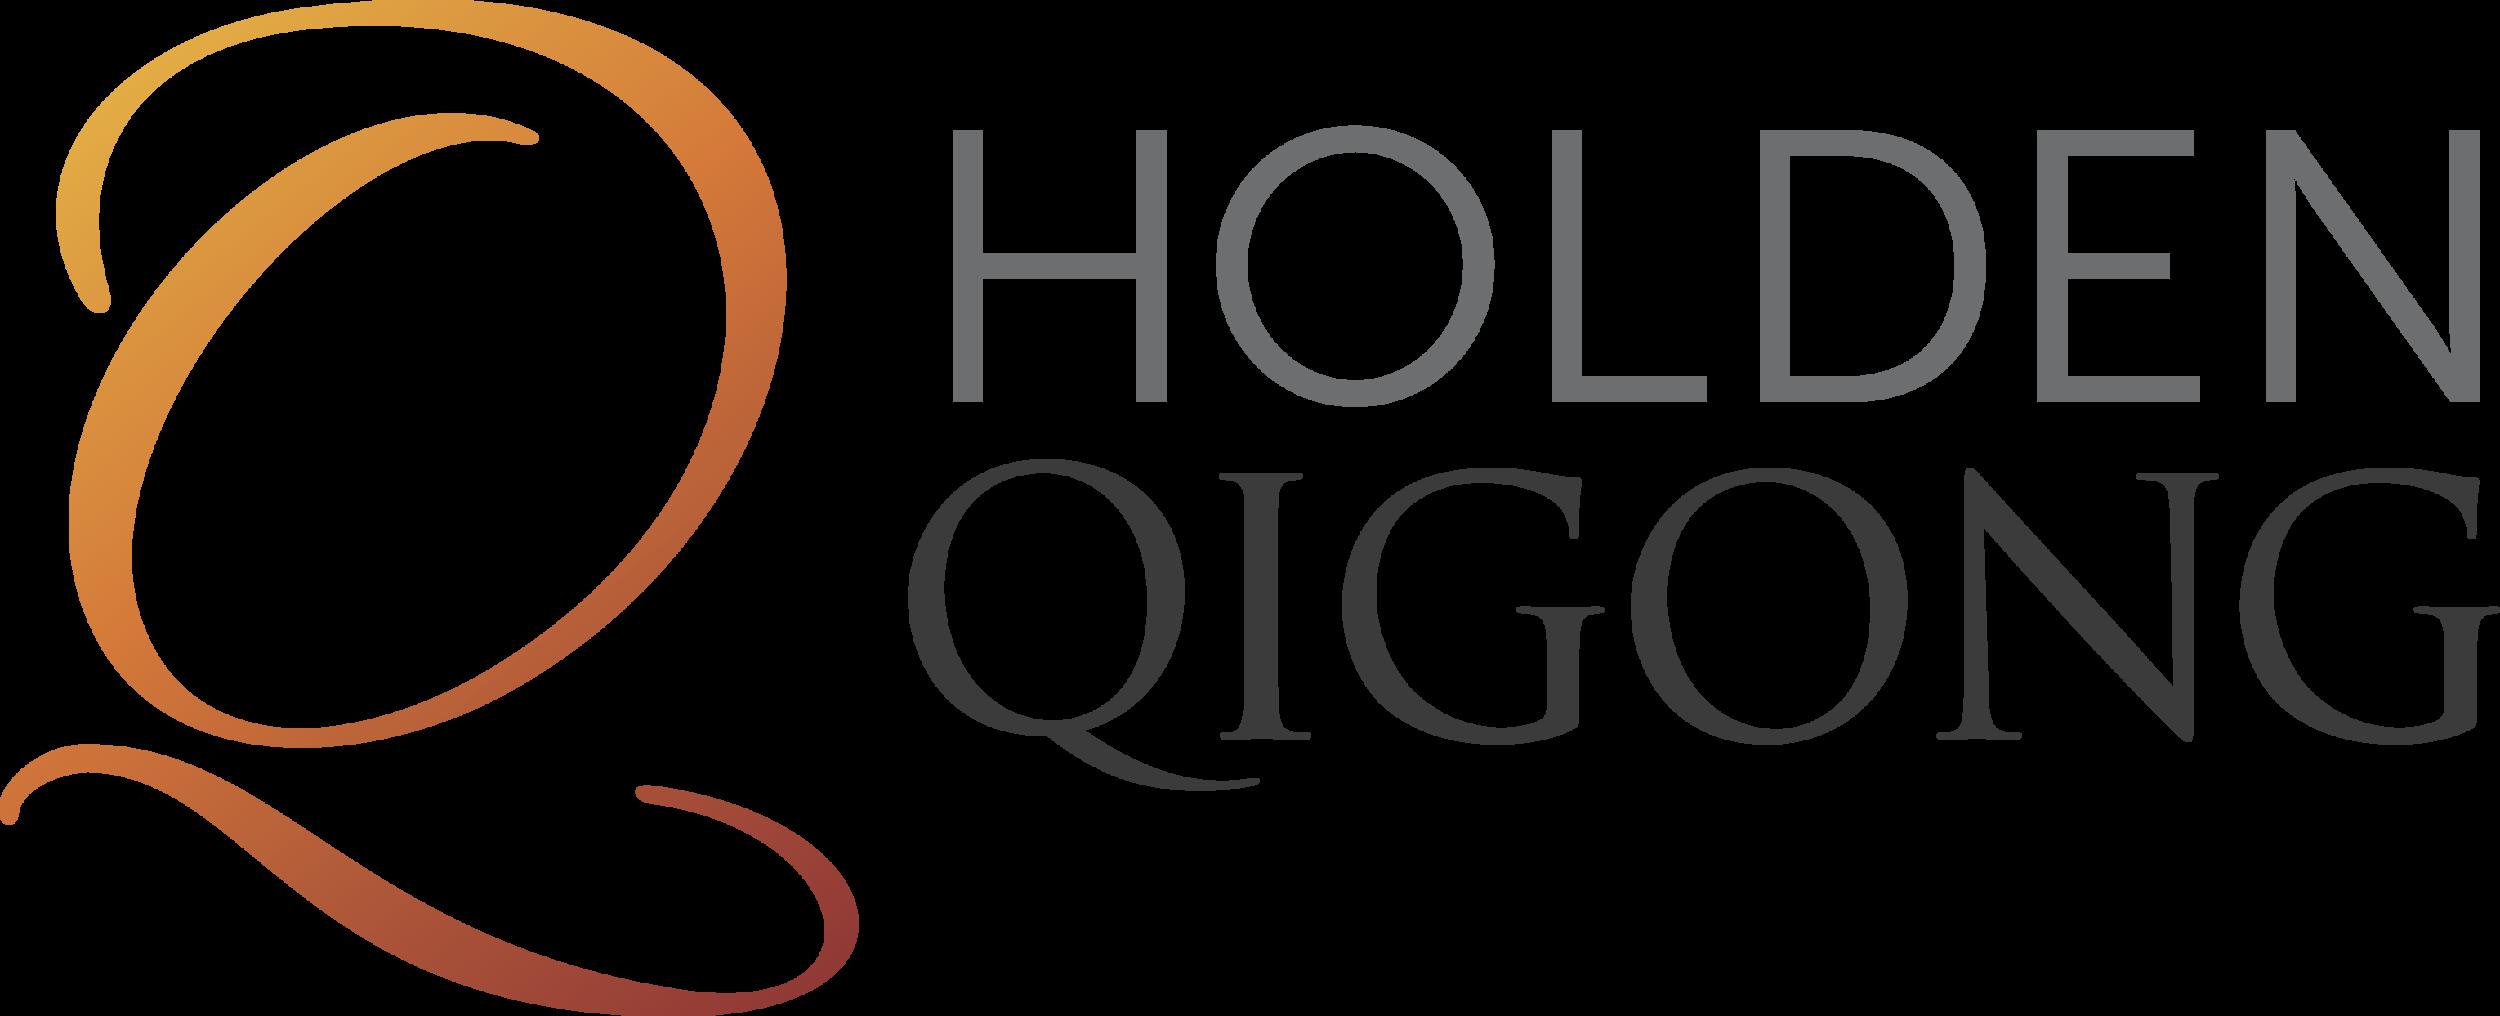 FINAL_holden_qigong_logo.png